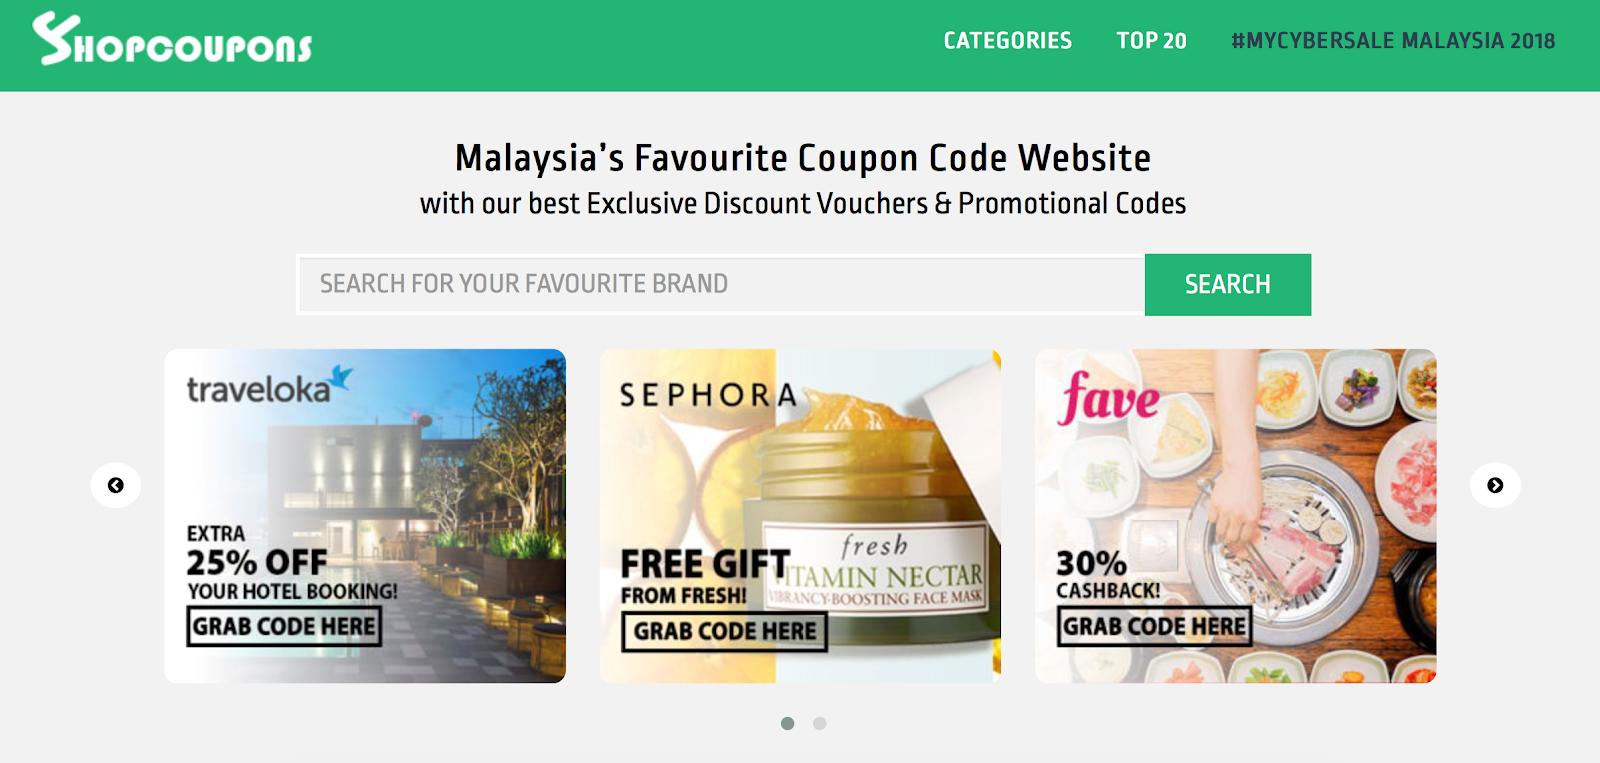 5 Kelebihan Online Shopping